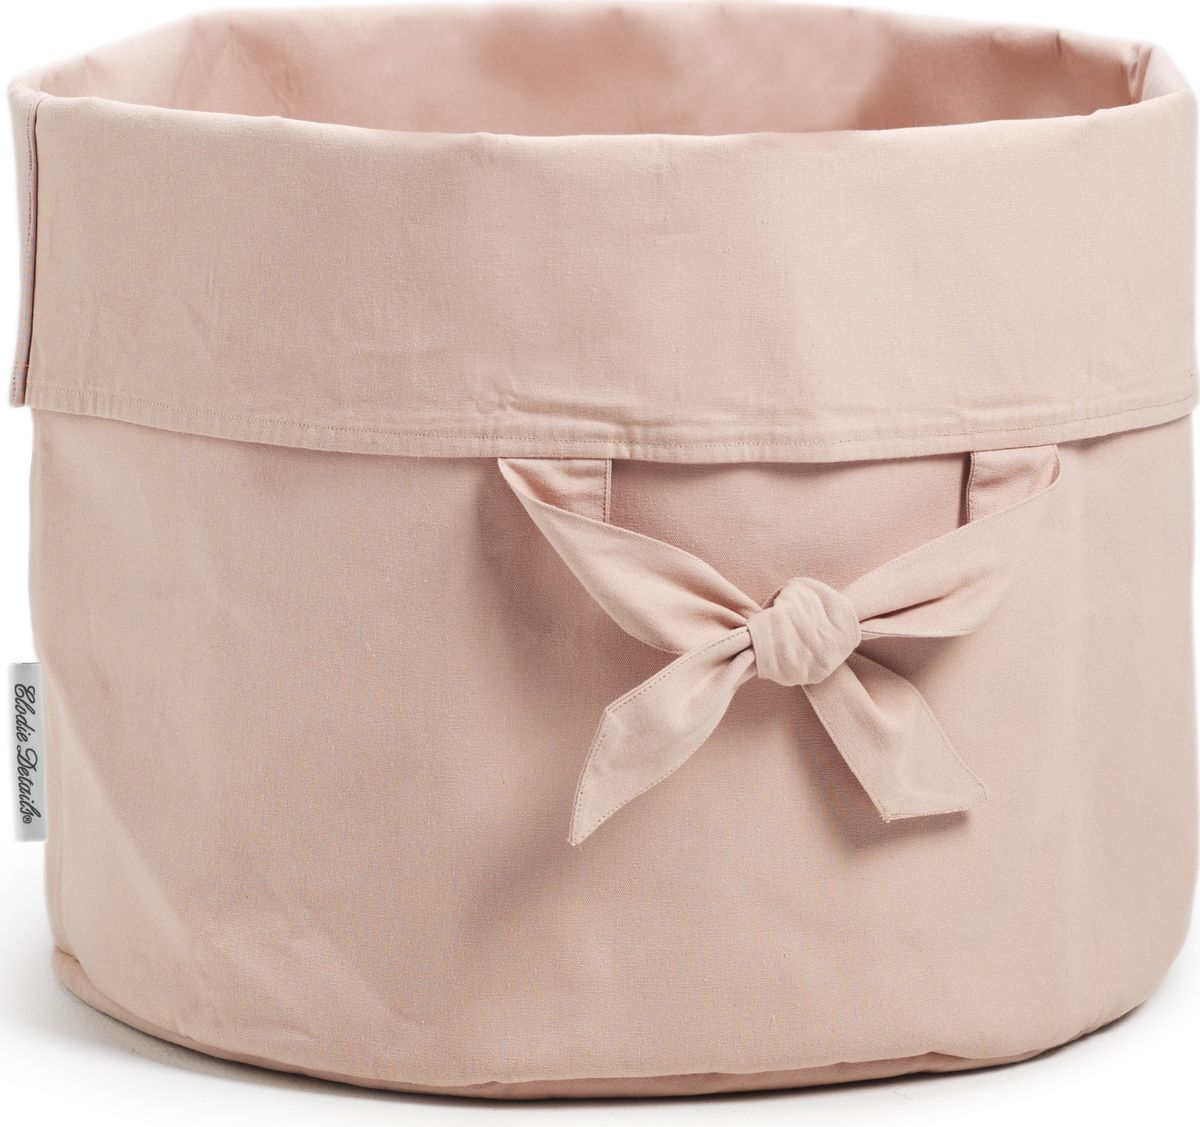 Elodie Details Корзина для детских принадлежностей Powder Pink